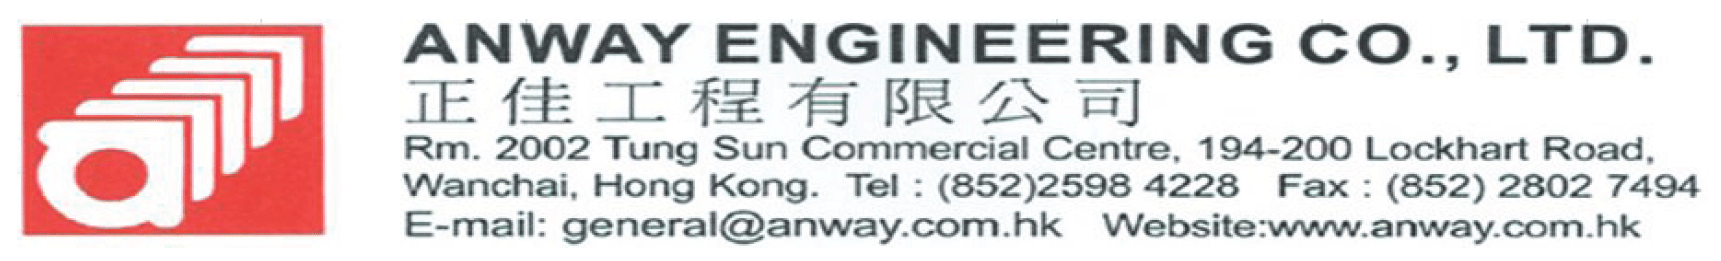 http://www.anway.com.hk/